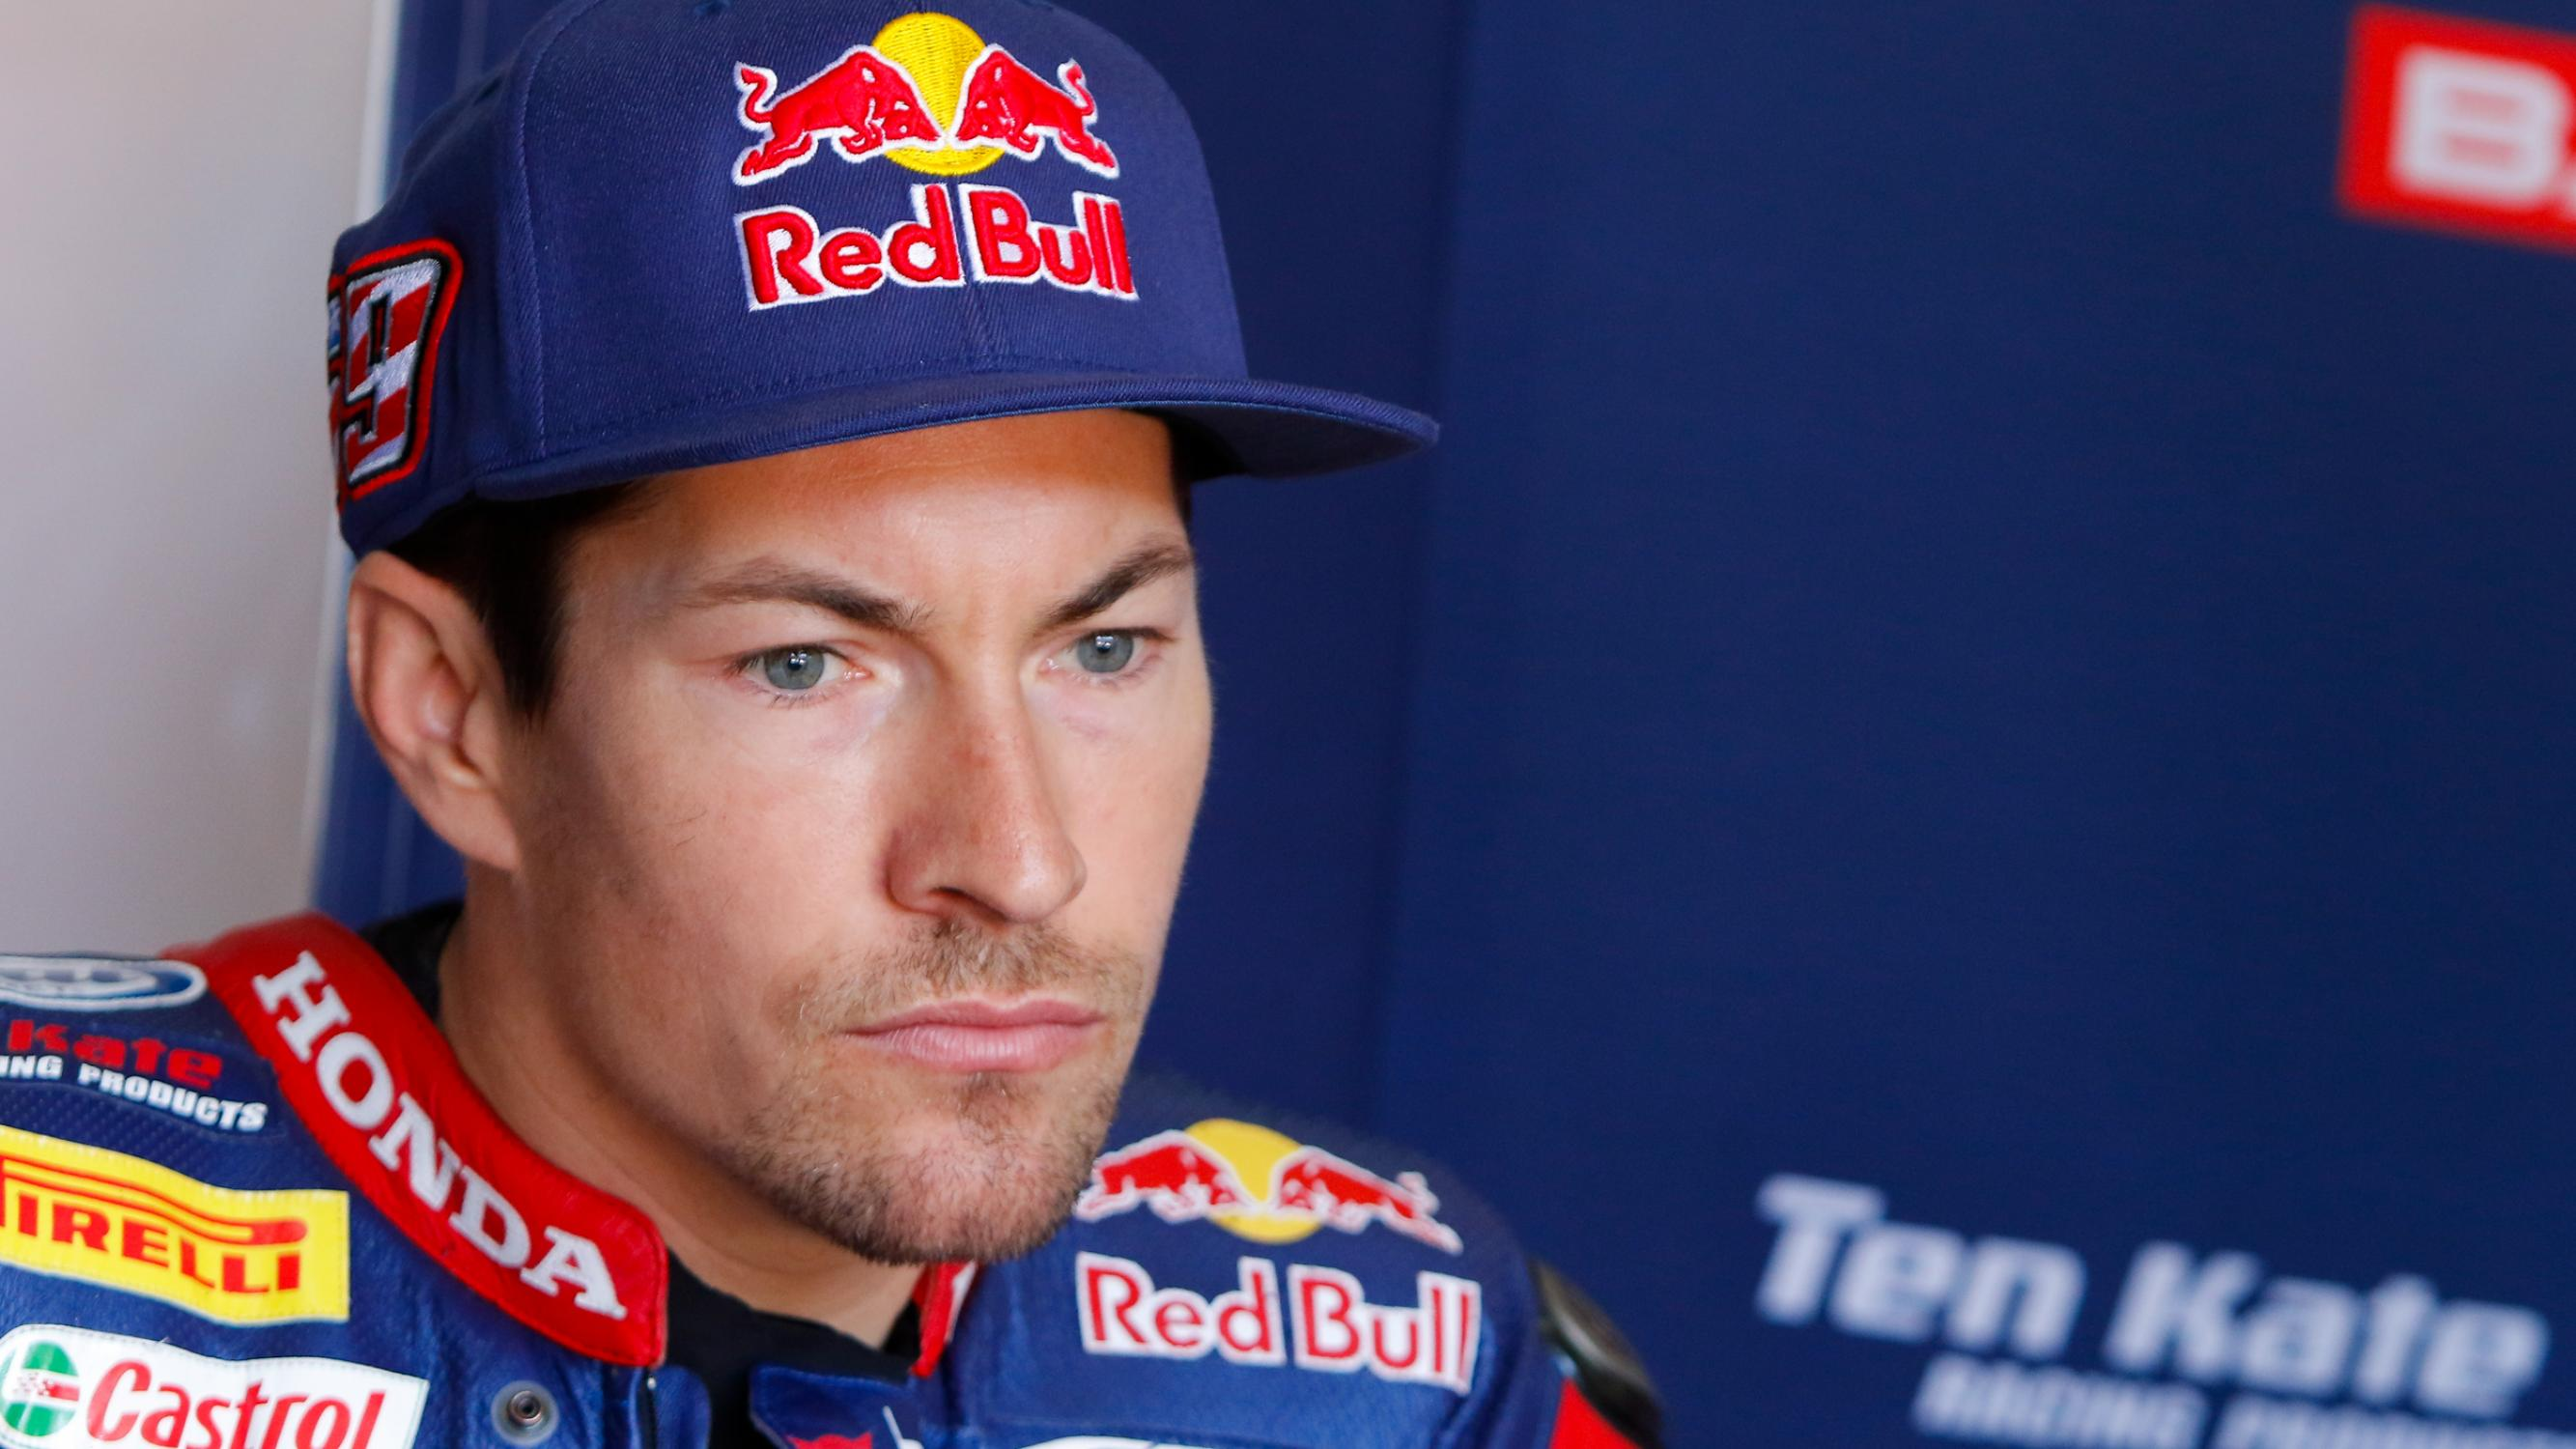 Rider insight with Freddie Spencer: Grand Prix de France